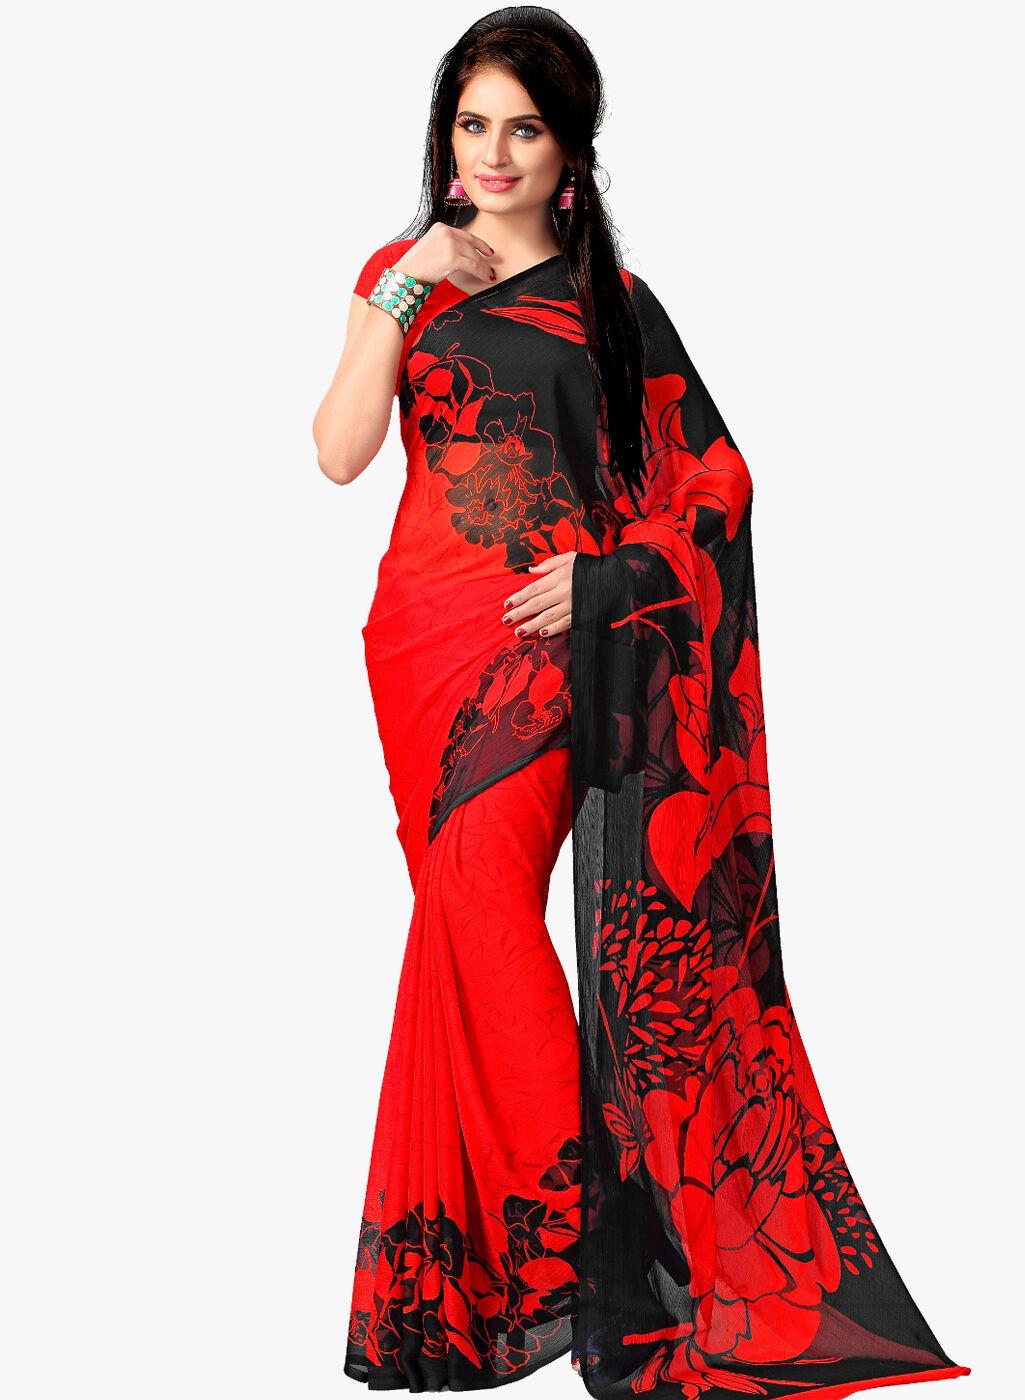 Red Black Printed Chiffon Saree Party Wear Indian Pakistani Designer Sari